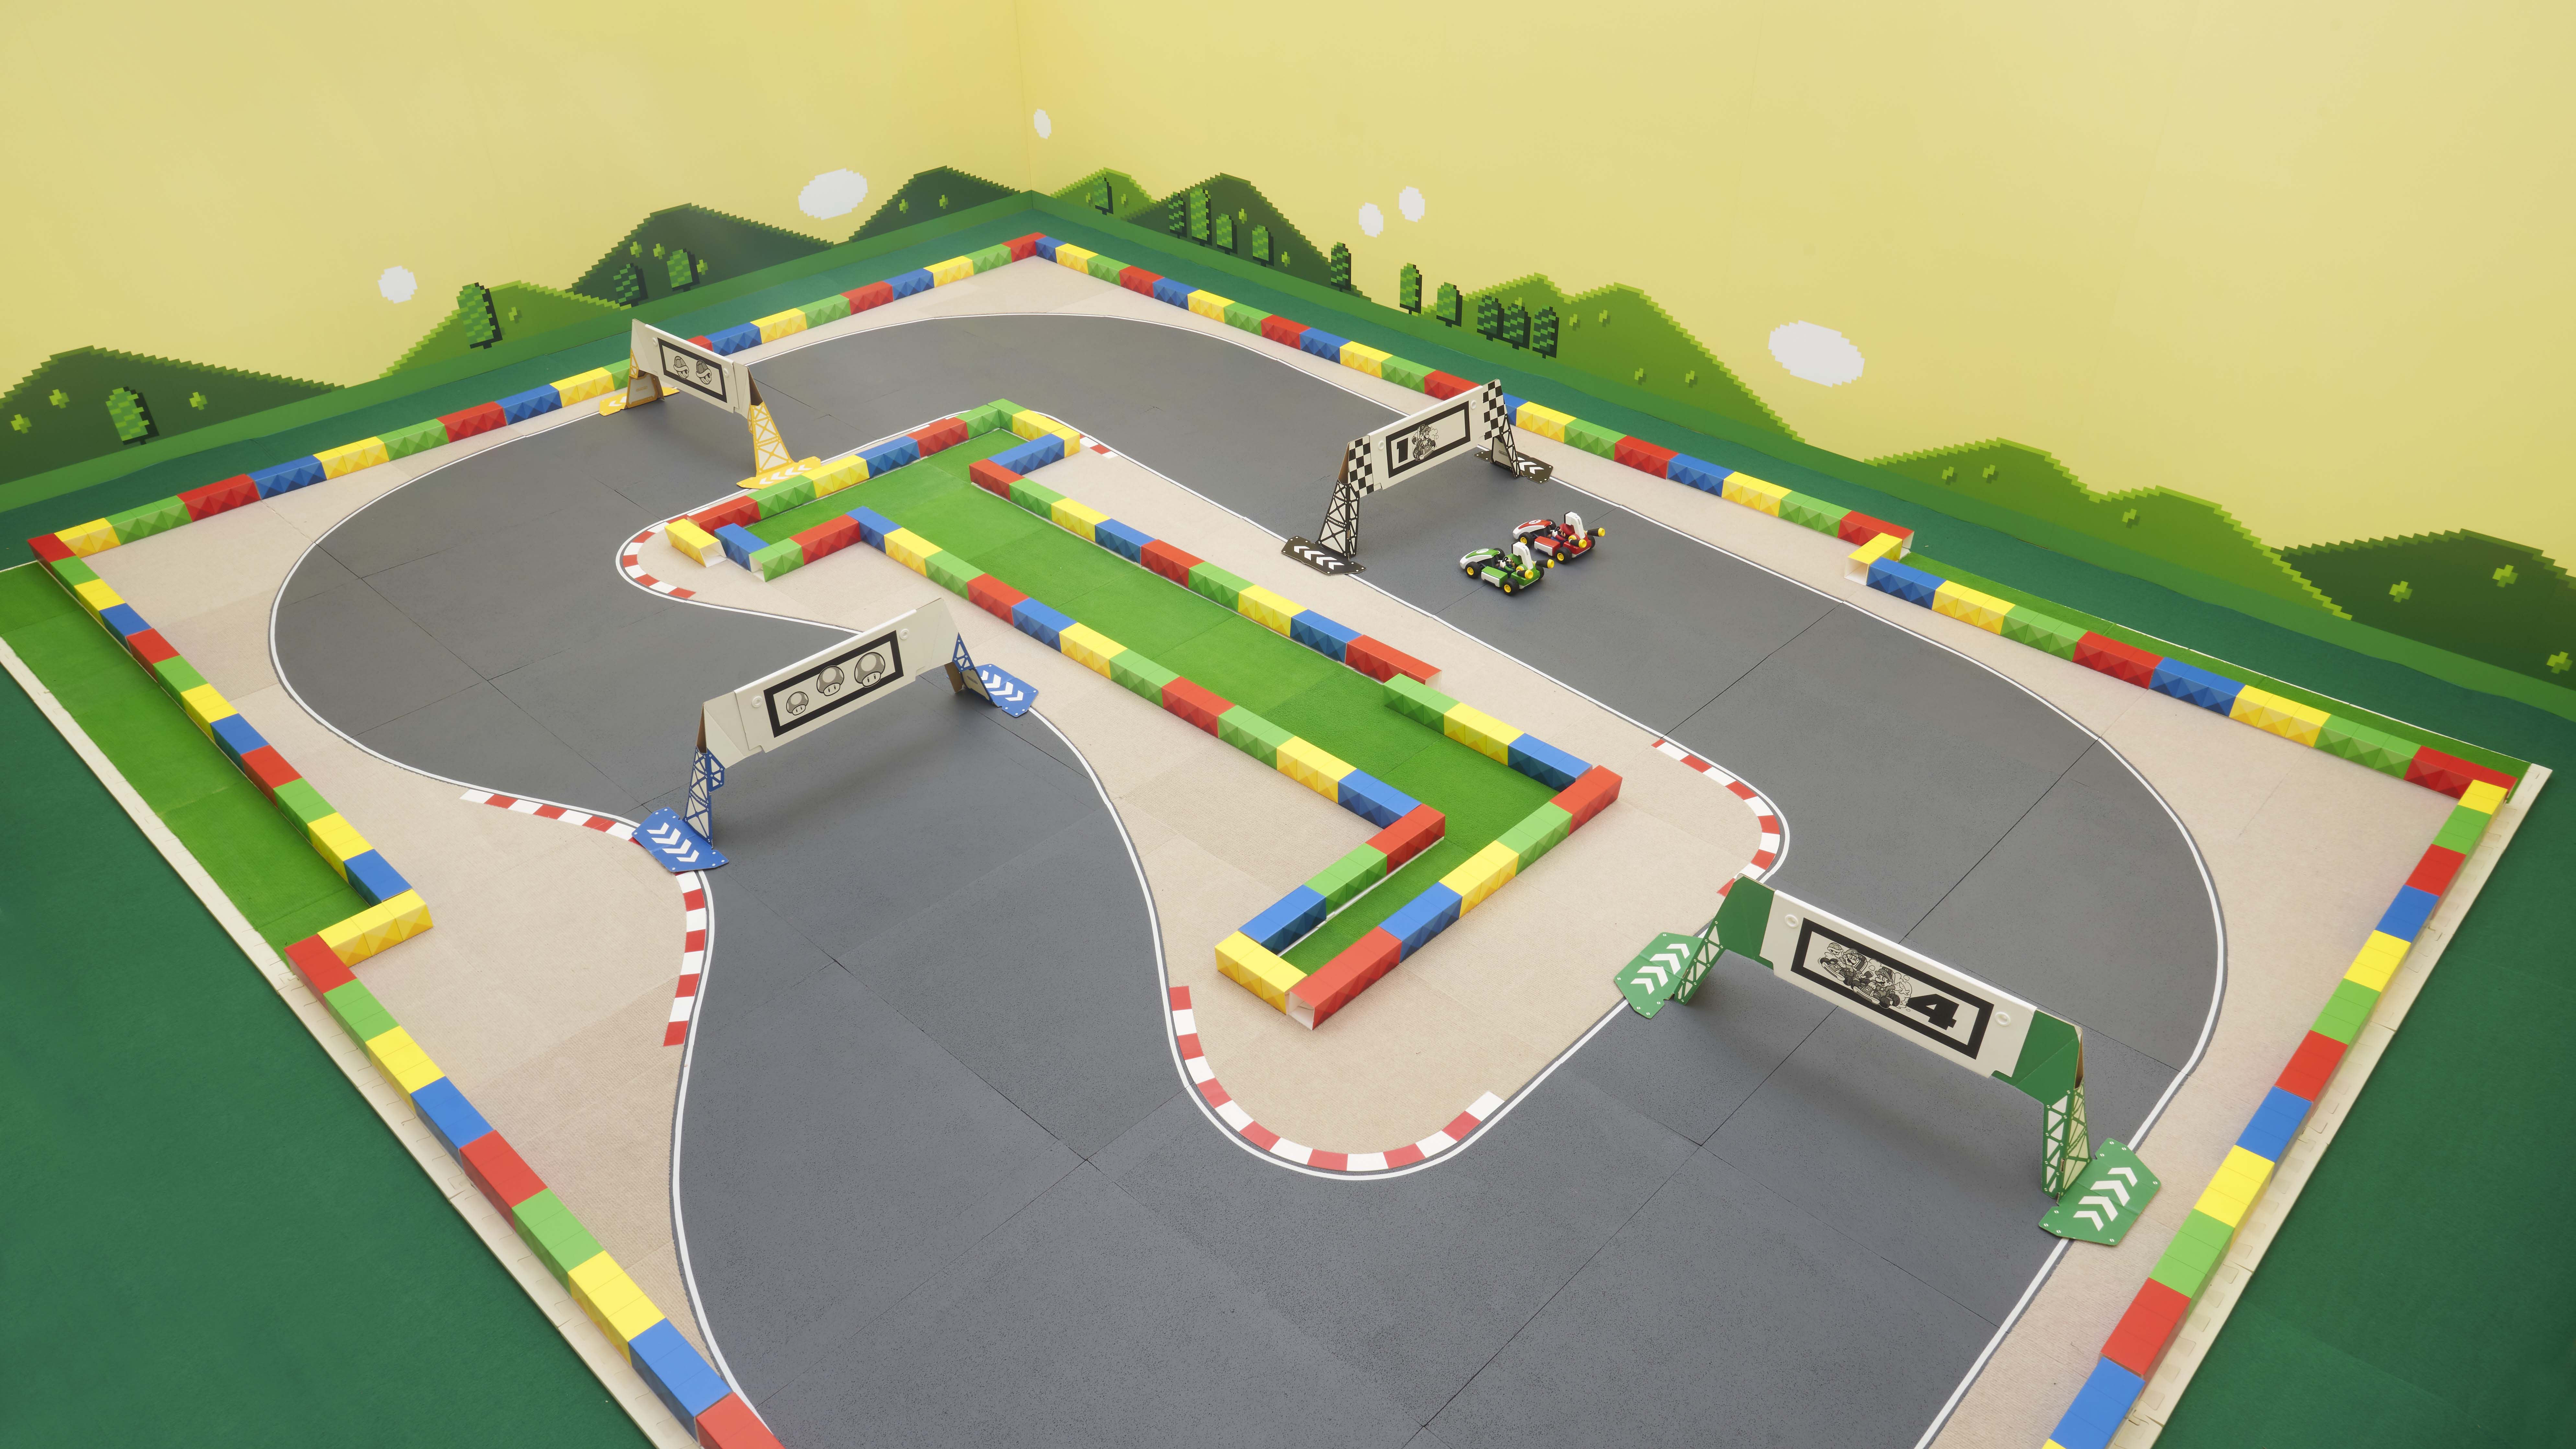 NSwitch_MarioKartLive_Overview_Circuit_Carousel_01.jpg